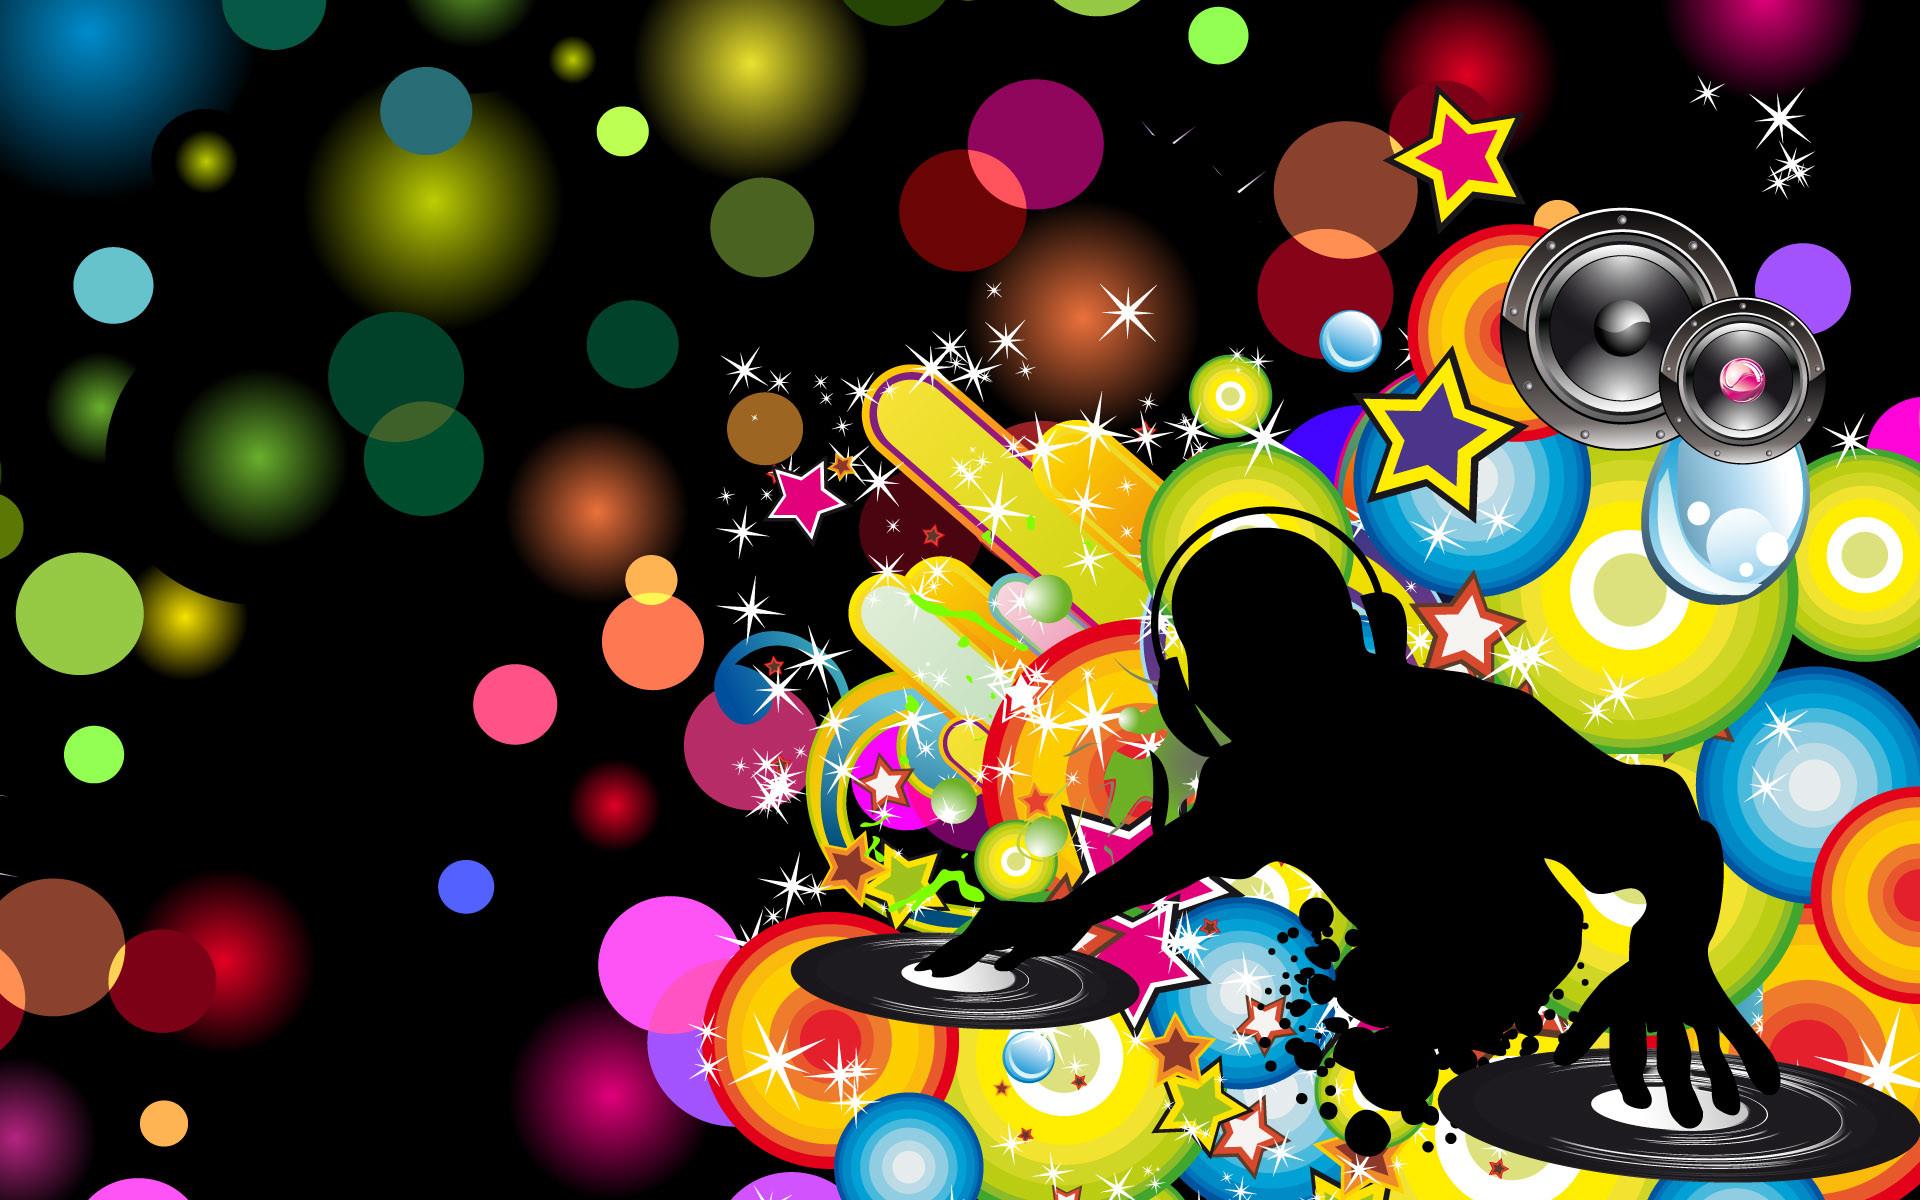 Dance abstract cool dj wallpapers.